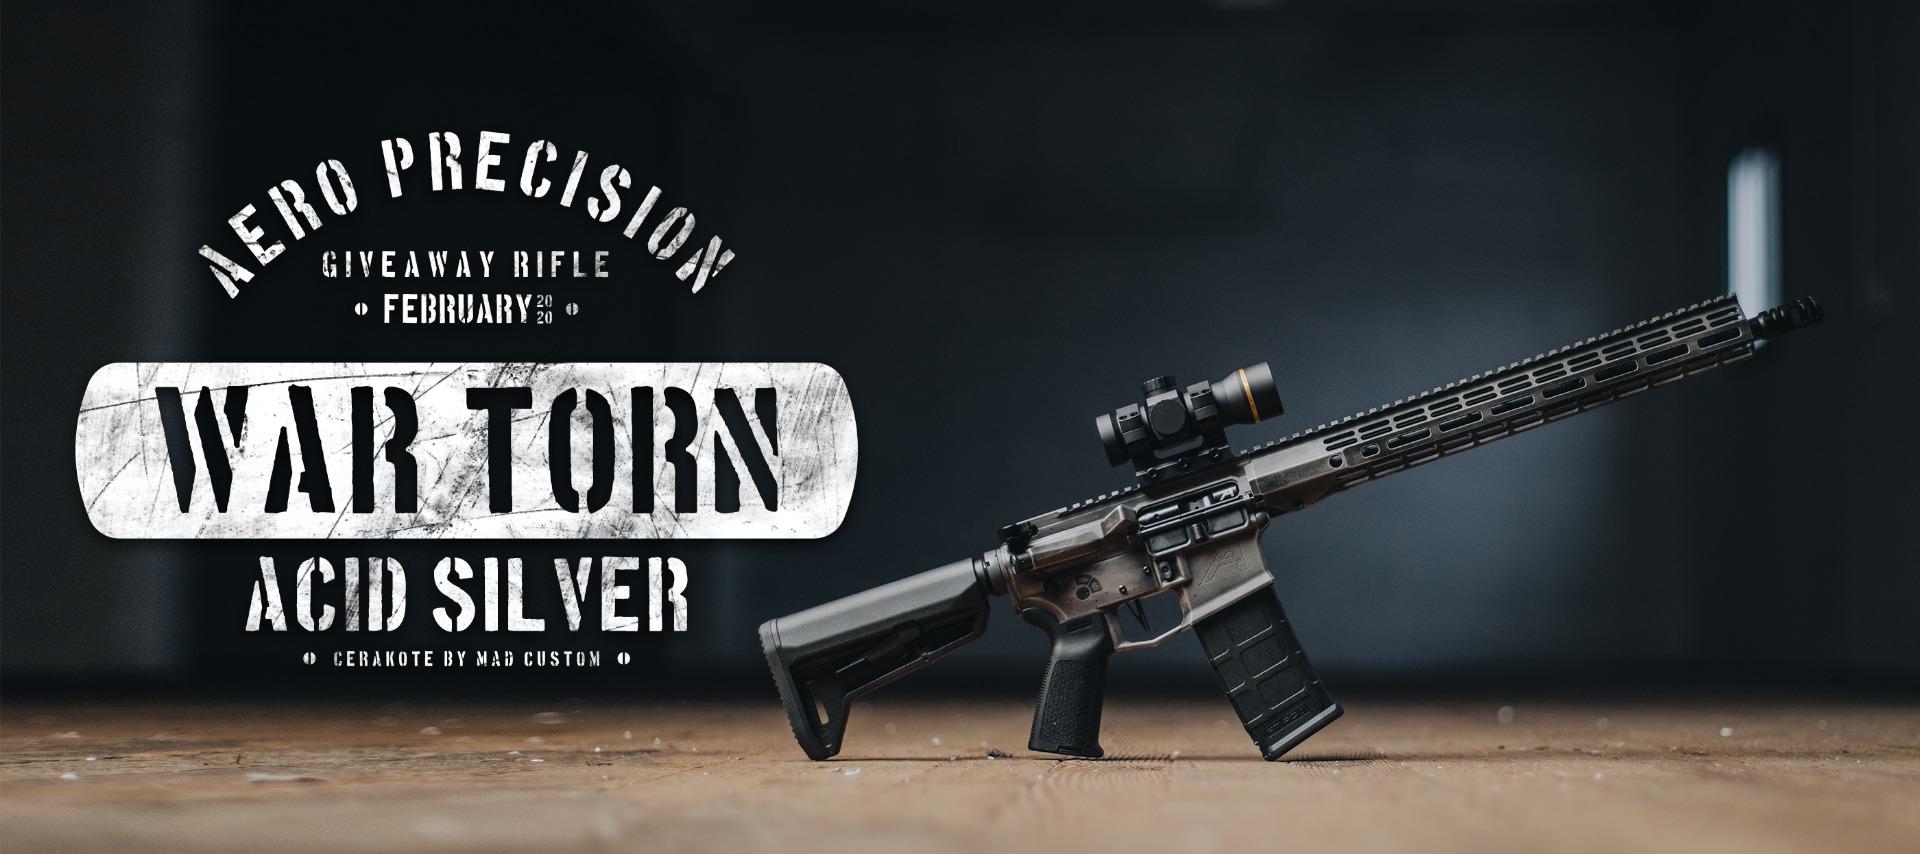 February Rifle Giveaway